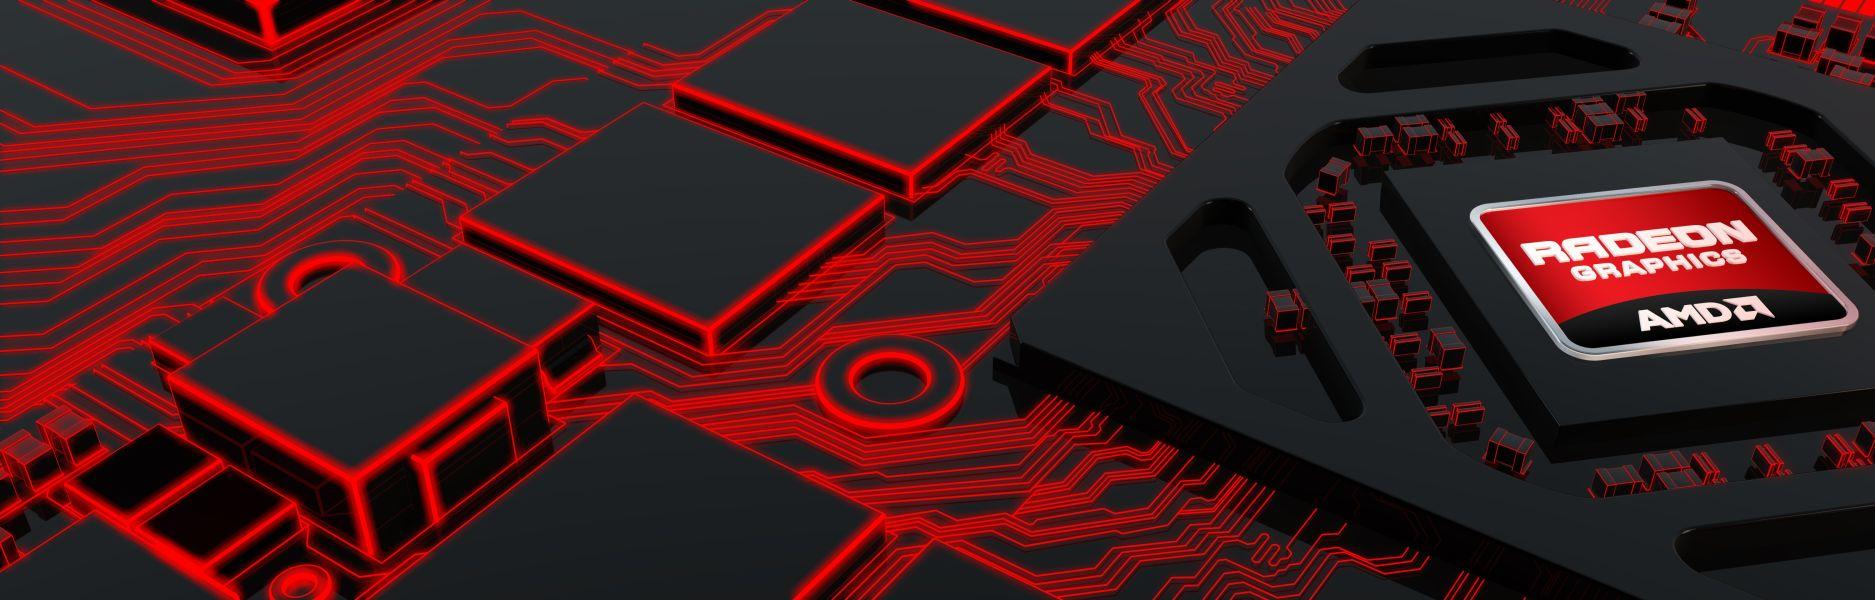 AMD Releases Radeon GPU-PRO Beta Driver for Ubuntu Linux with Vulkan